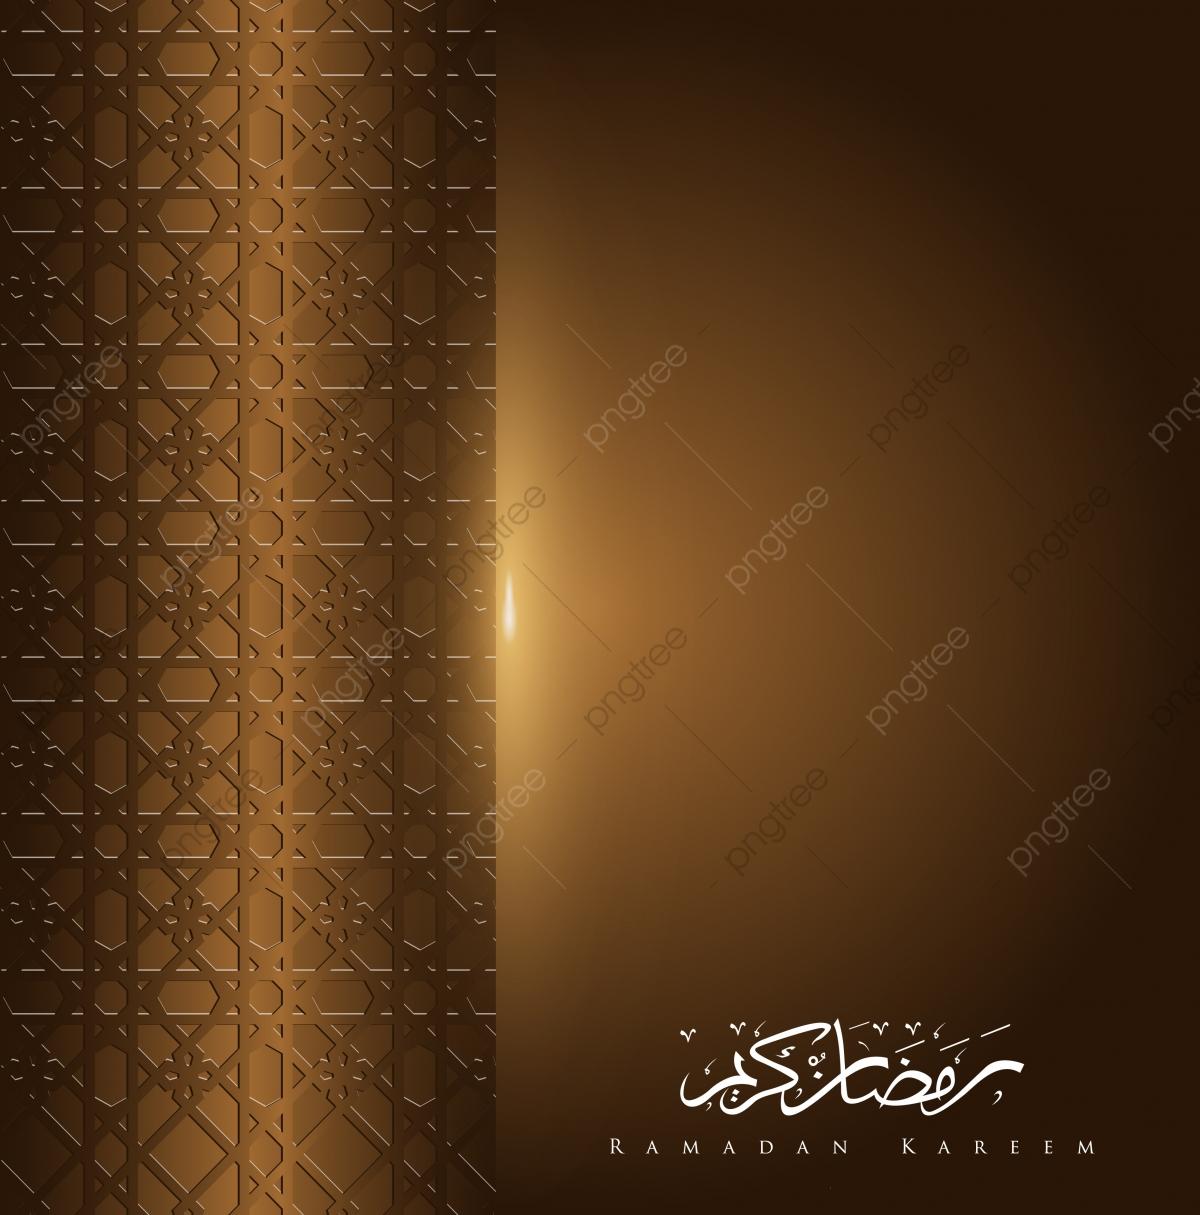 صور اسلامية 2020 4 1